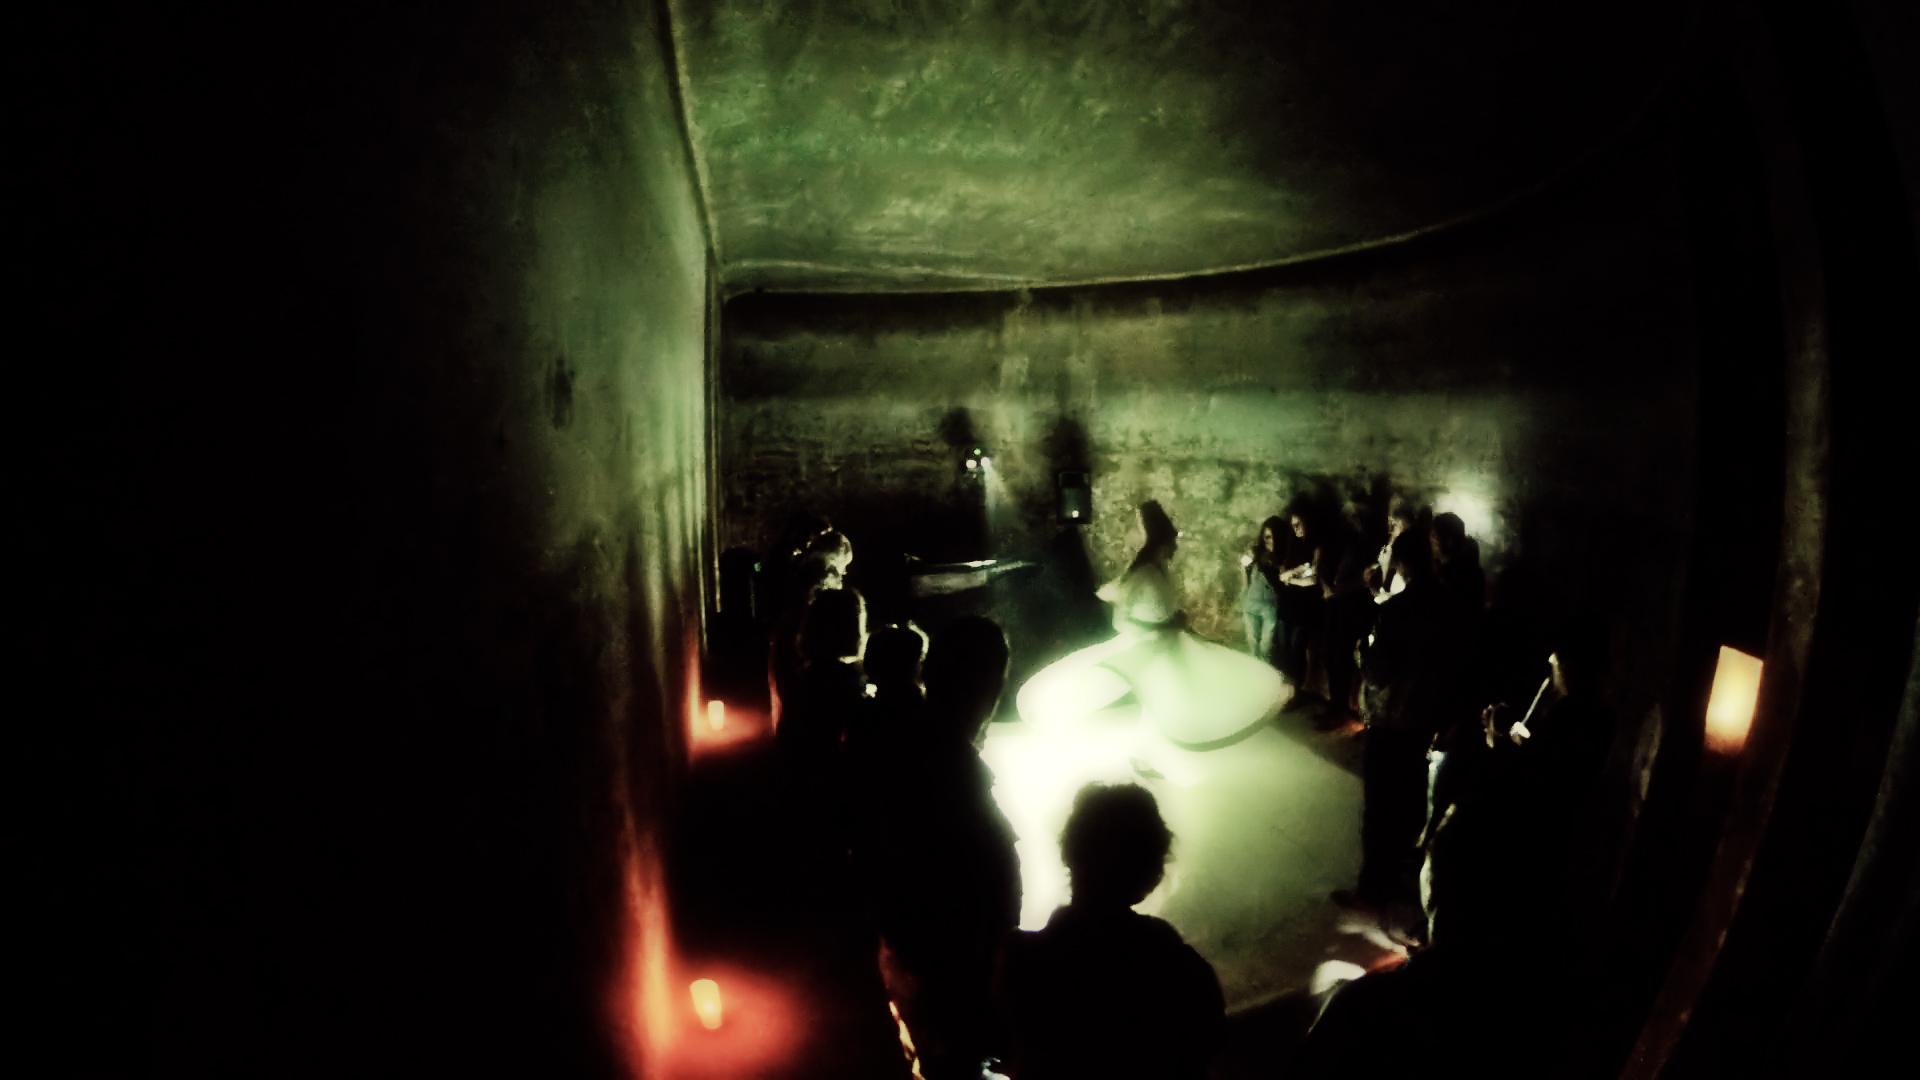 IKEGO@BLIKOPENER effects.Still001